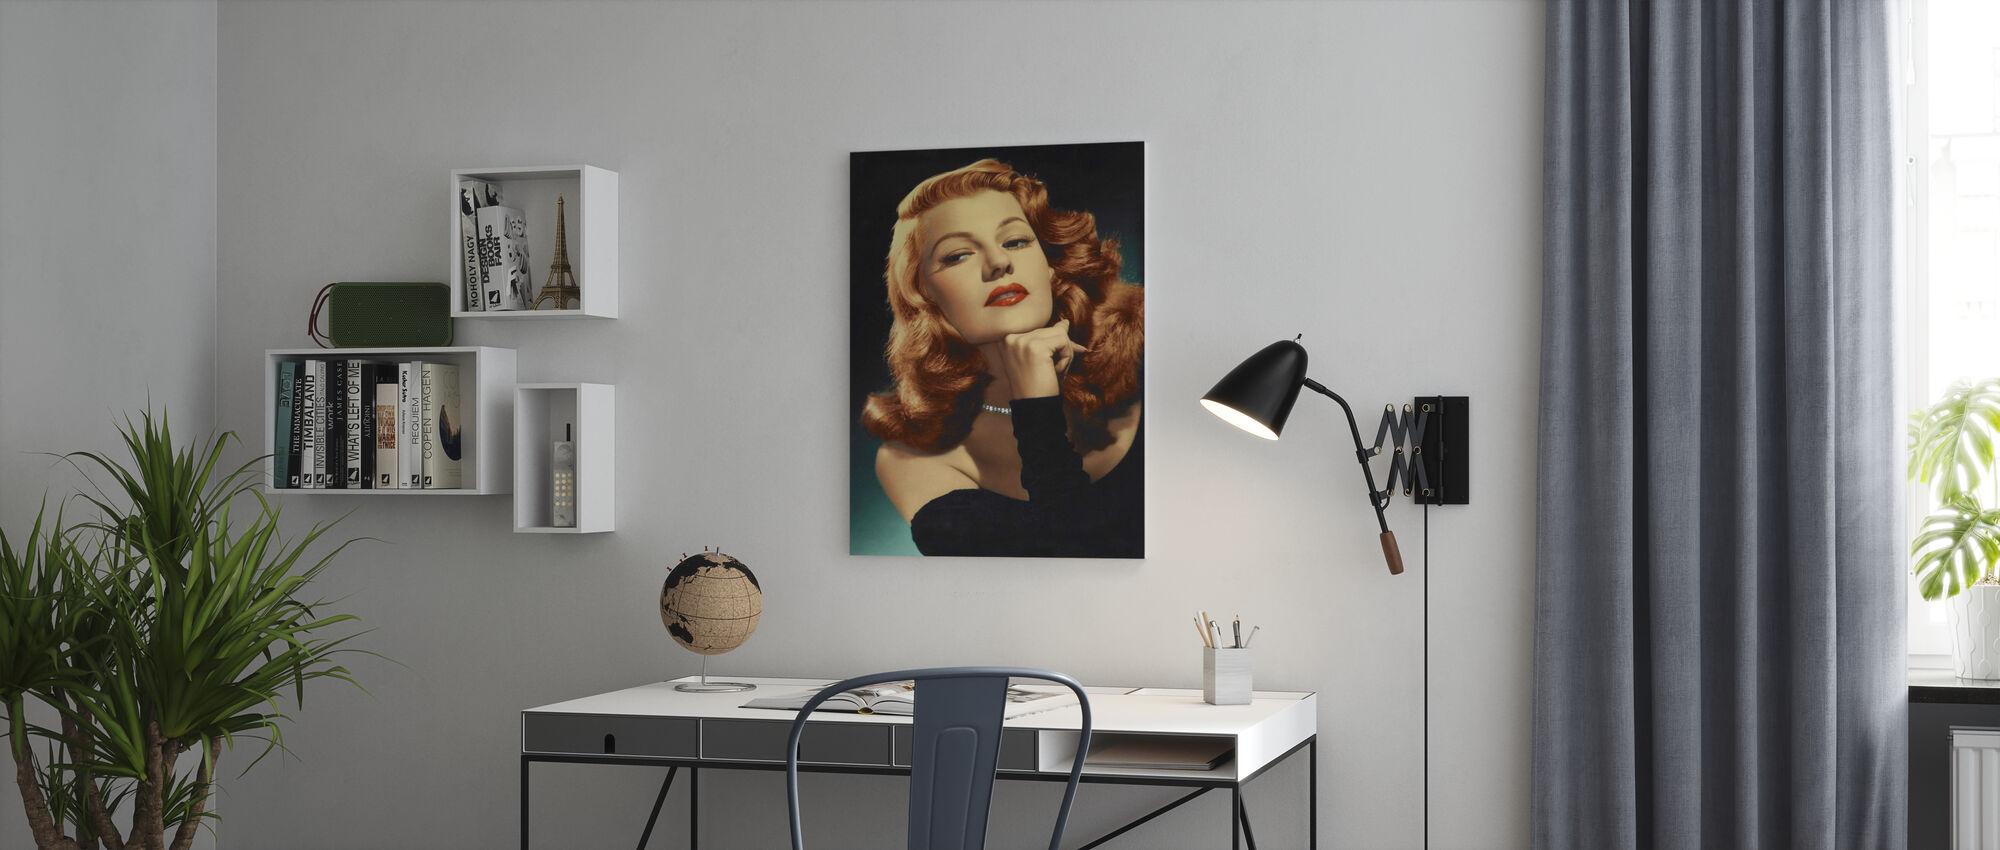 Rita Hayworth i Gilda - Canvastavla - Kontor